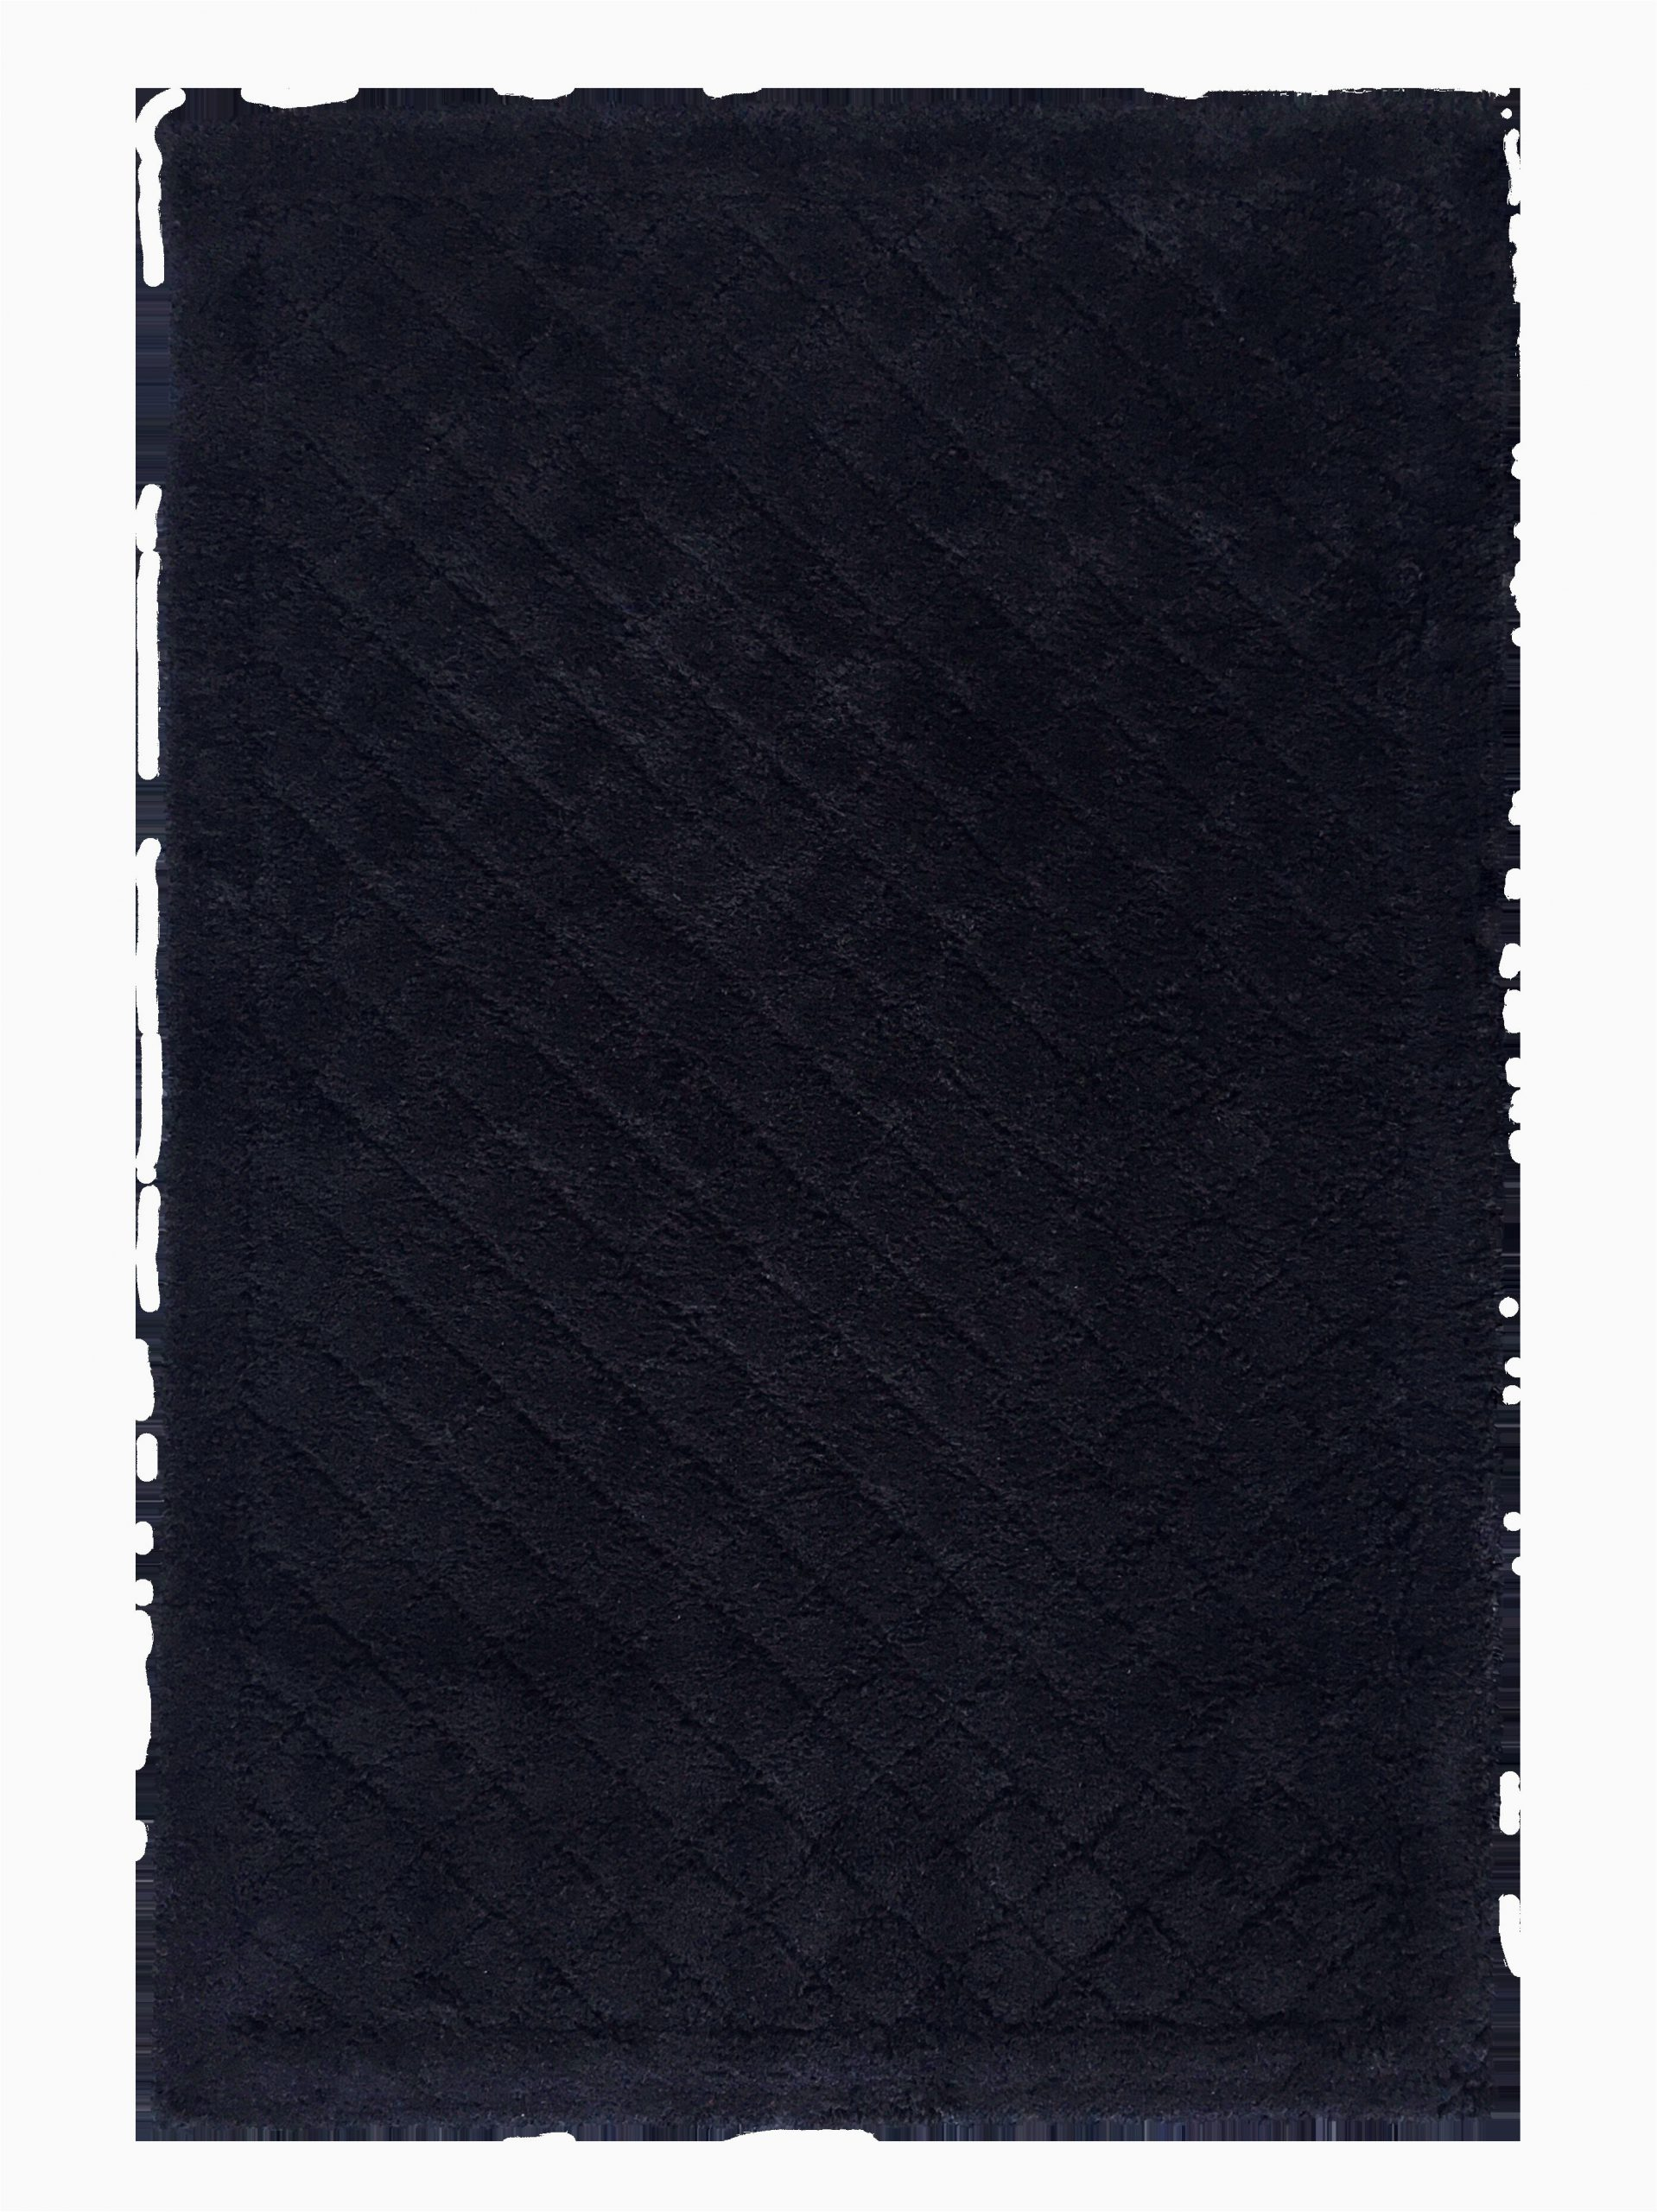 Black Cotton Bath Rug Mayshar Excellent Diamond Rectangle Cotton Non Slip Bath Rug